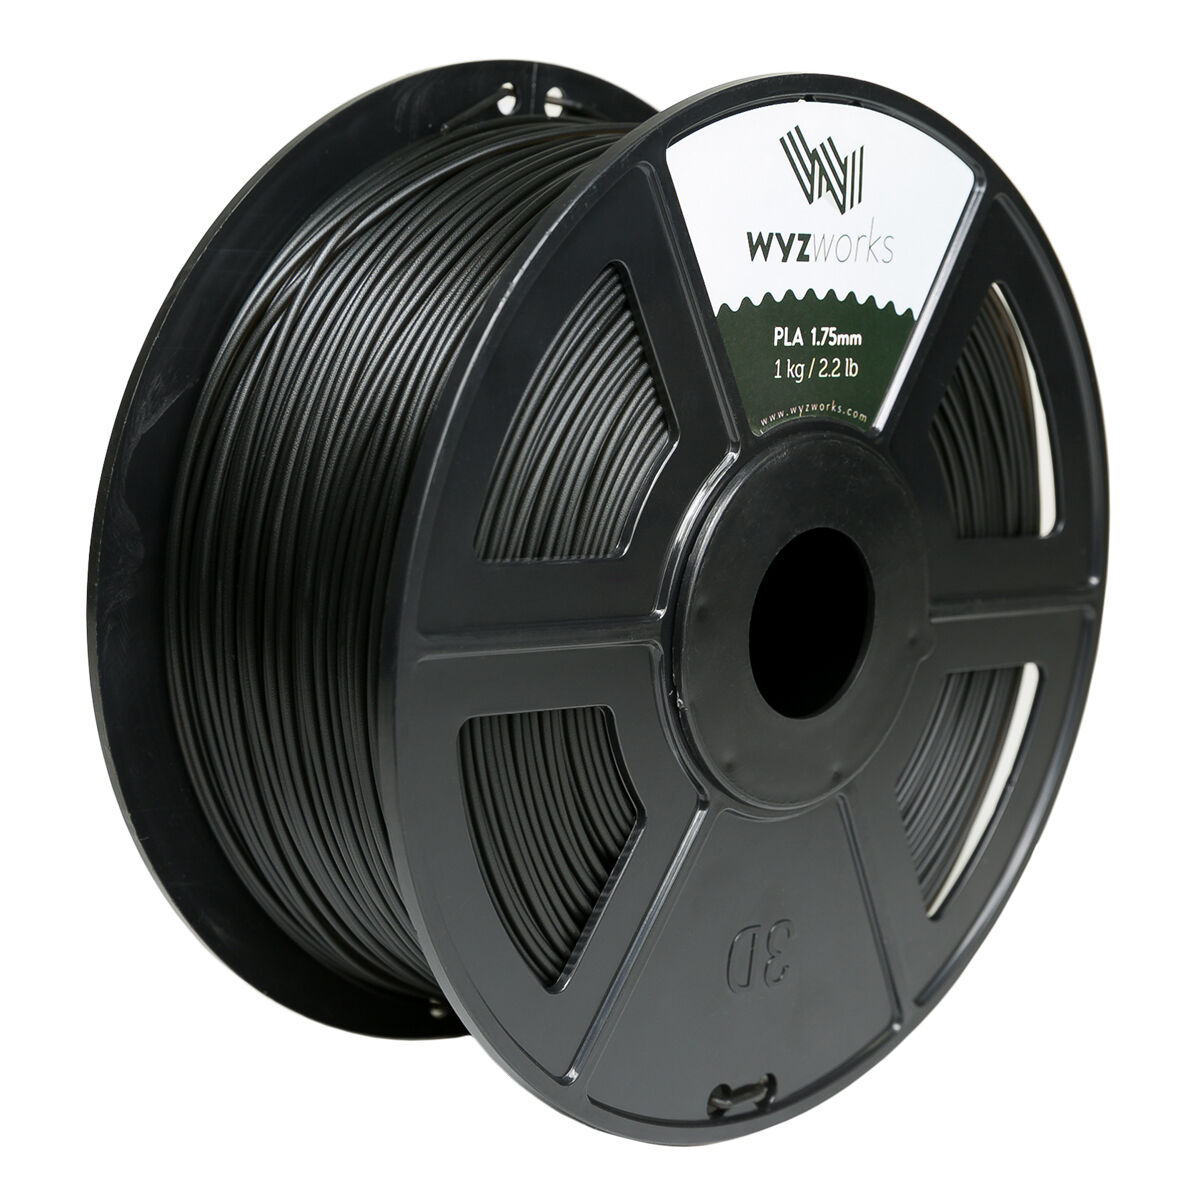 Translucent Black PLA 1.75mm WYZworks 3D Printer Premium Filament 1kg/2.2lb